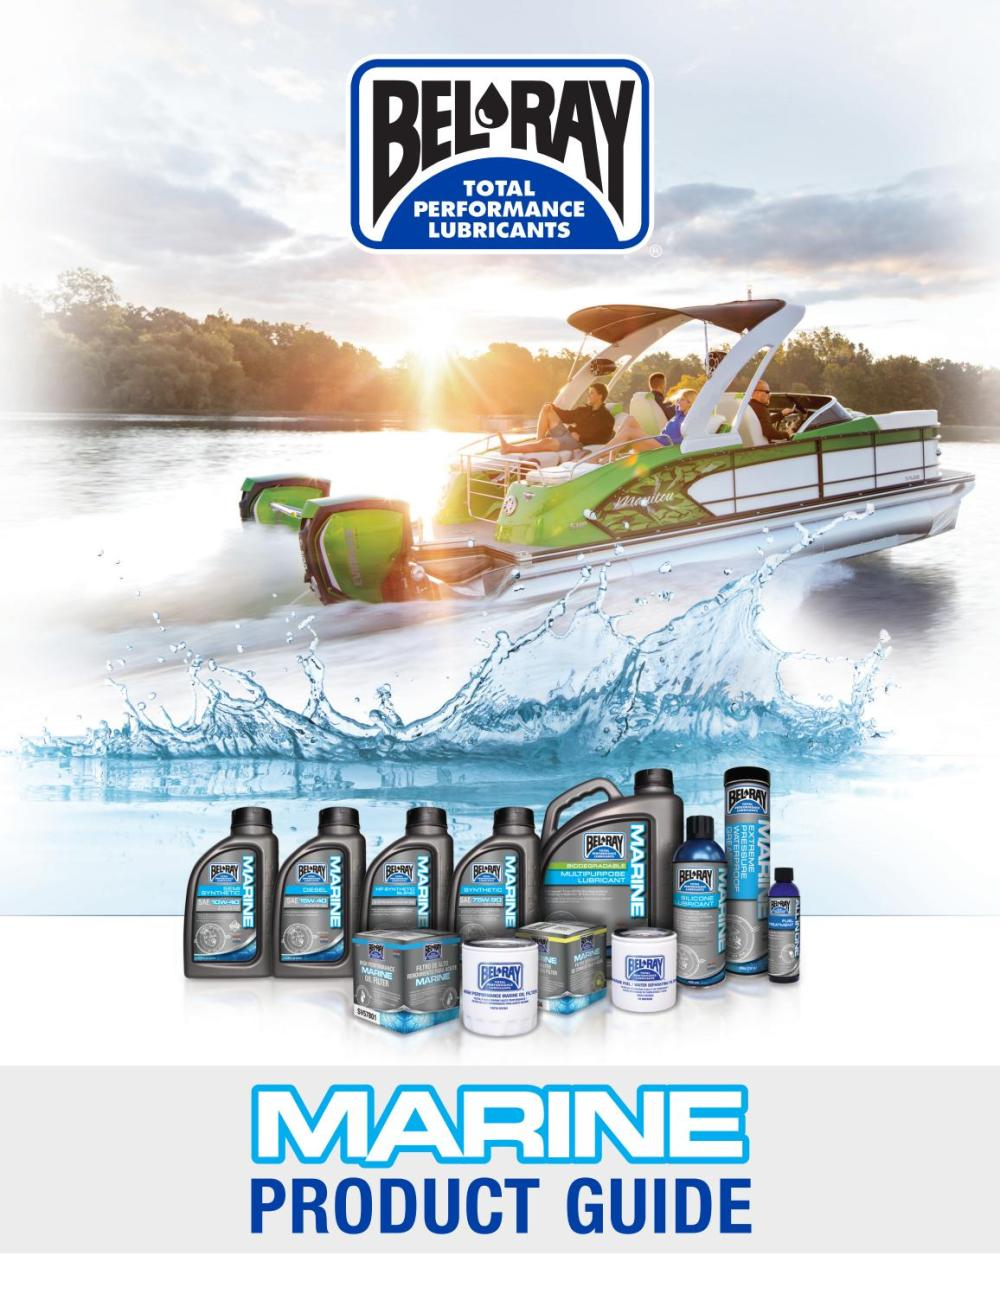 medium resolution of bel ray marine product guide 2017